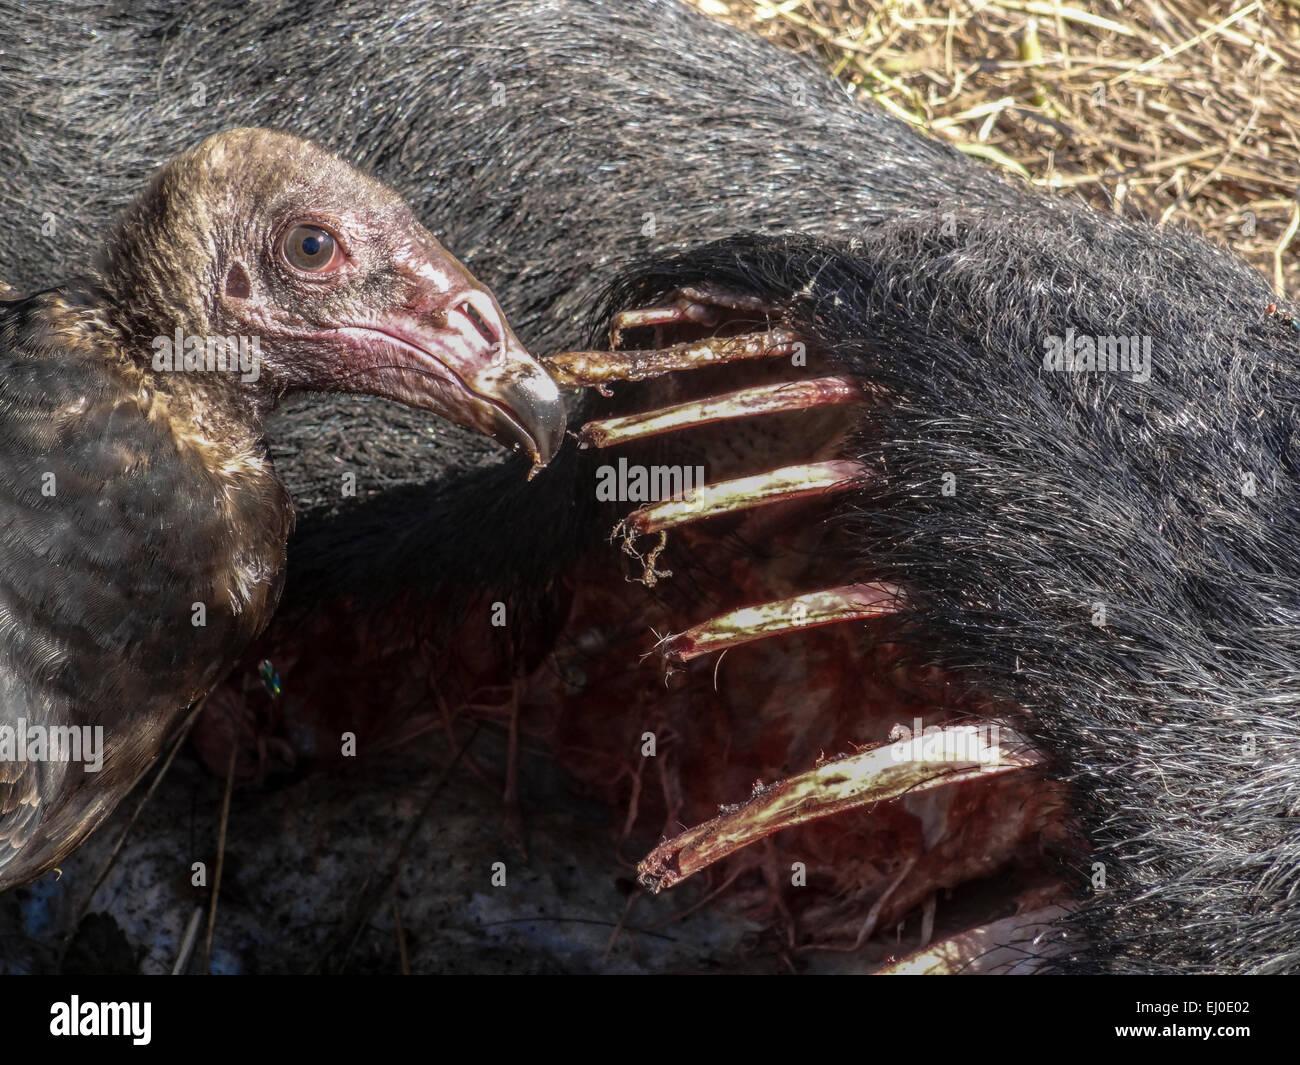 animal, carcass, Carnivora, corpse, dead, Feral hog, Hagerman, National, Wildlife, Refuge, Lake Texoma, pig, remains, - Stock Image